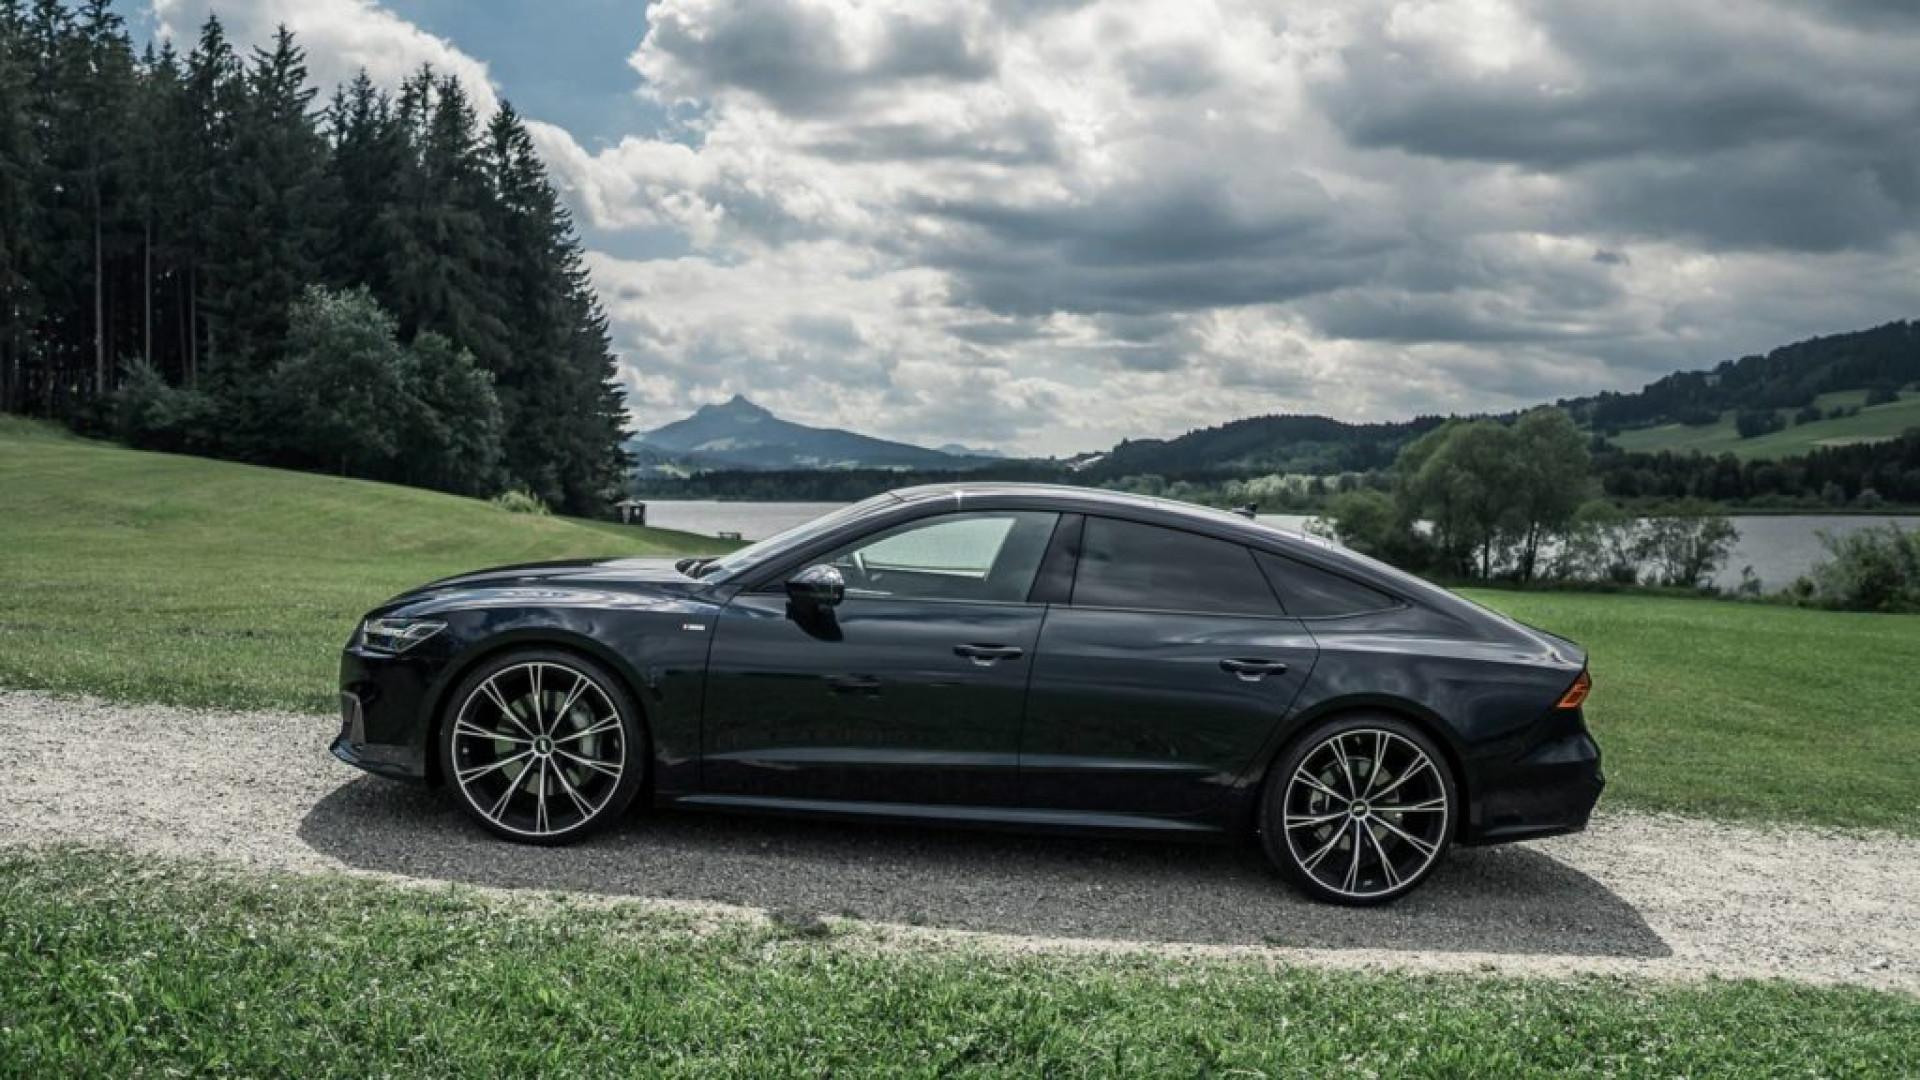 Vem aí o novo Audi A7 Sportback. Já conhece?